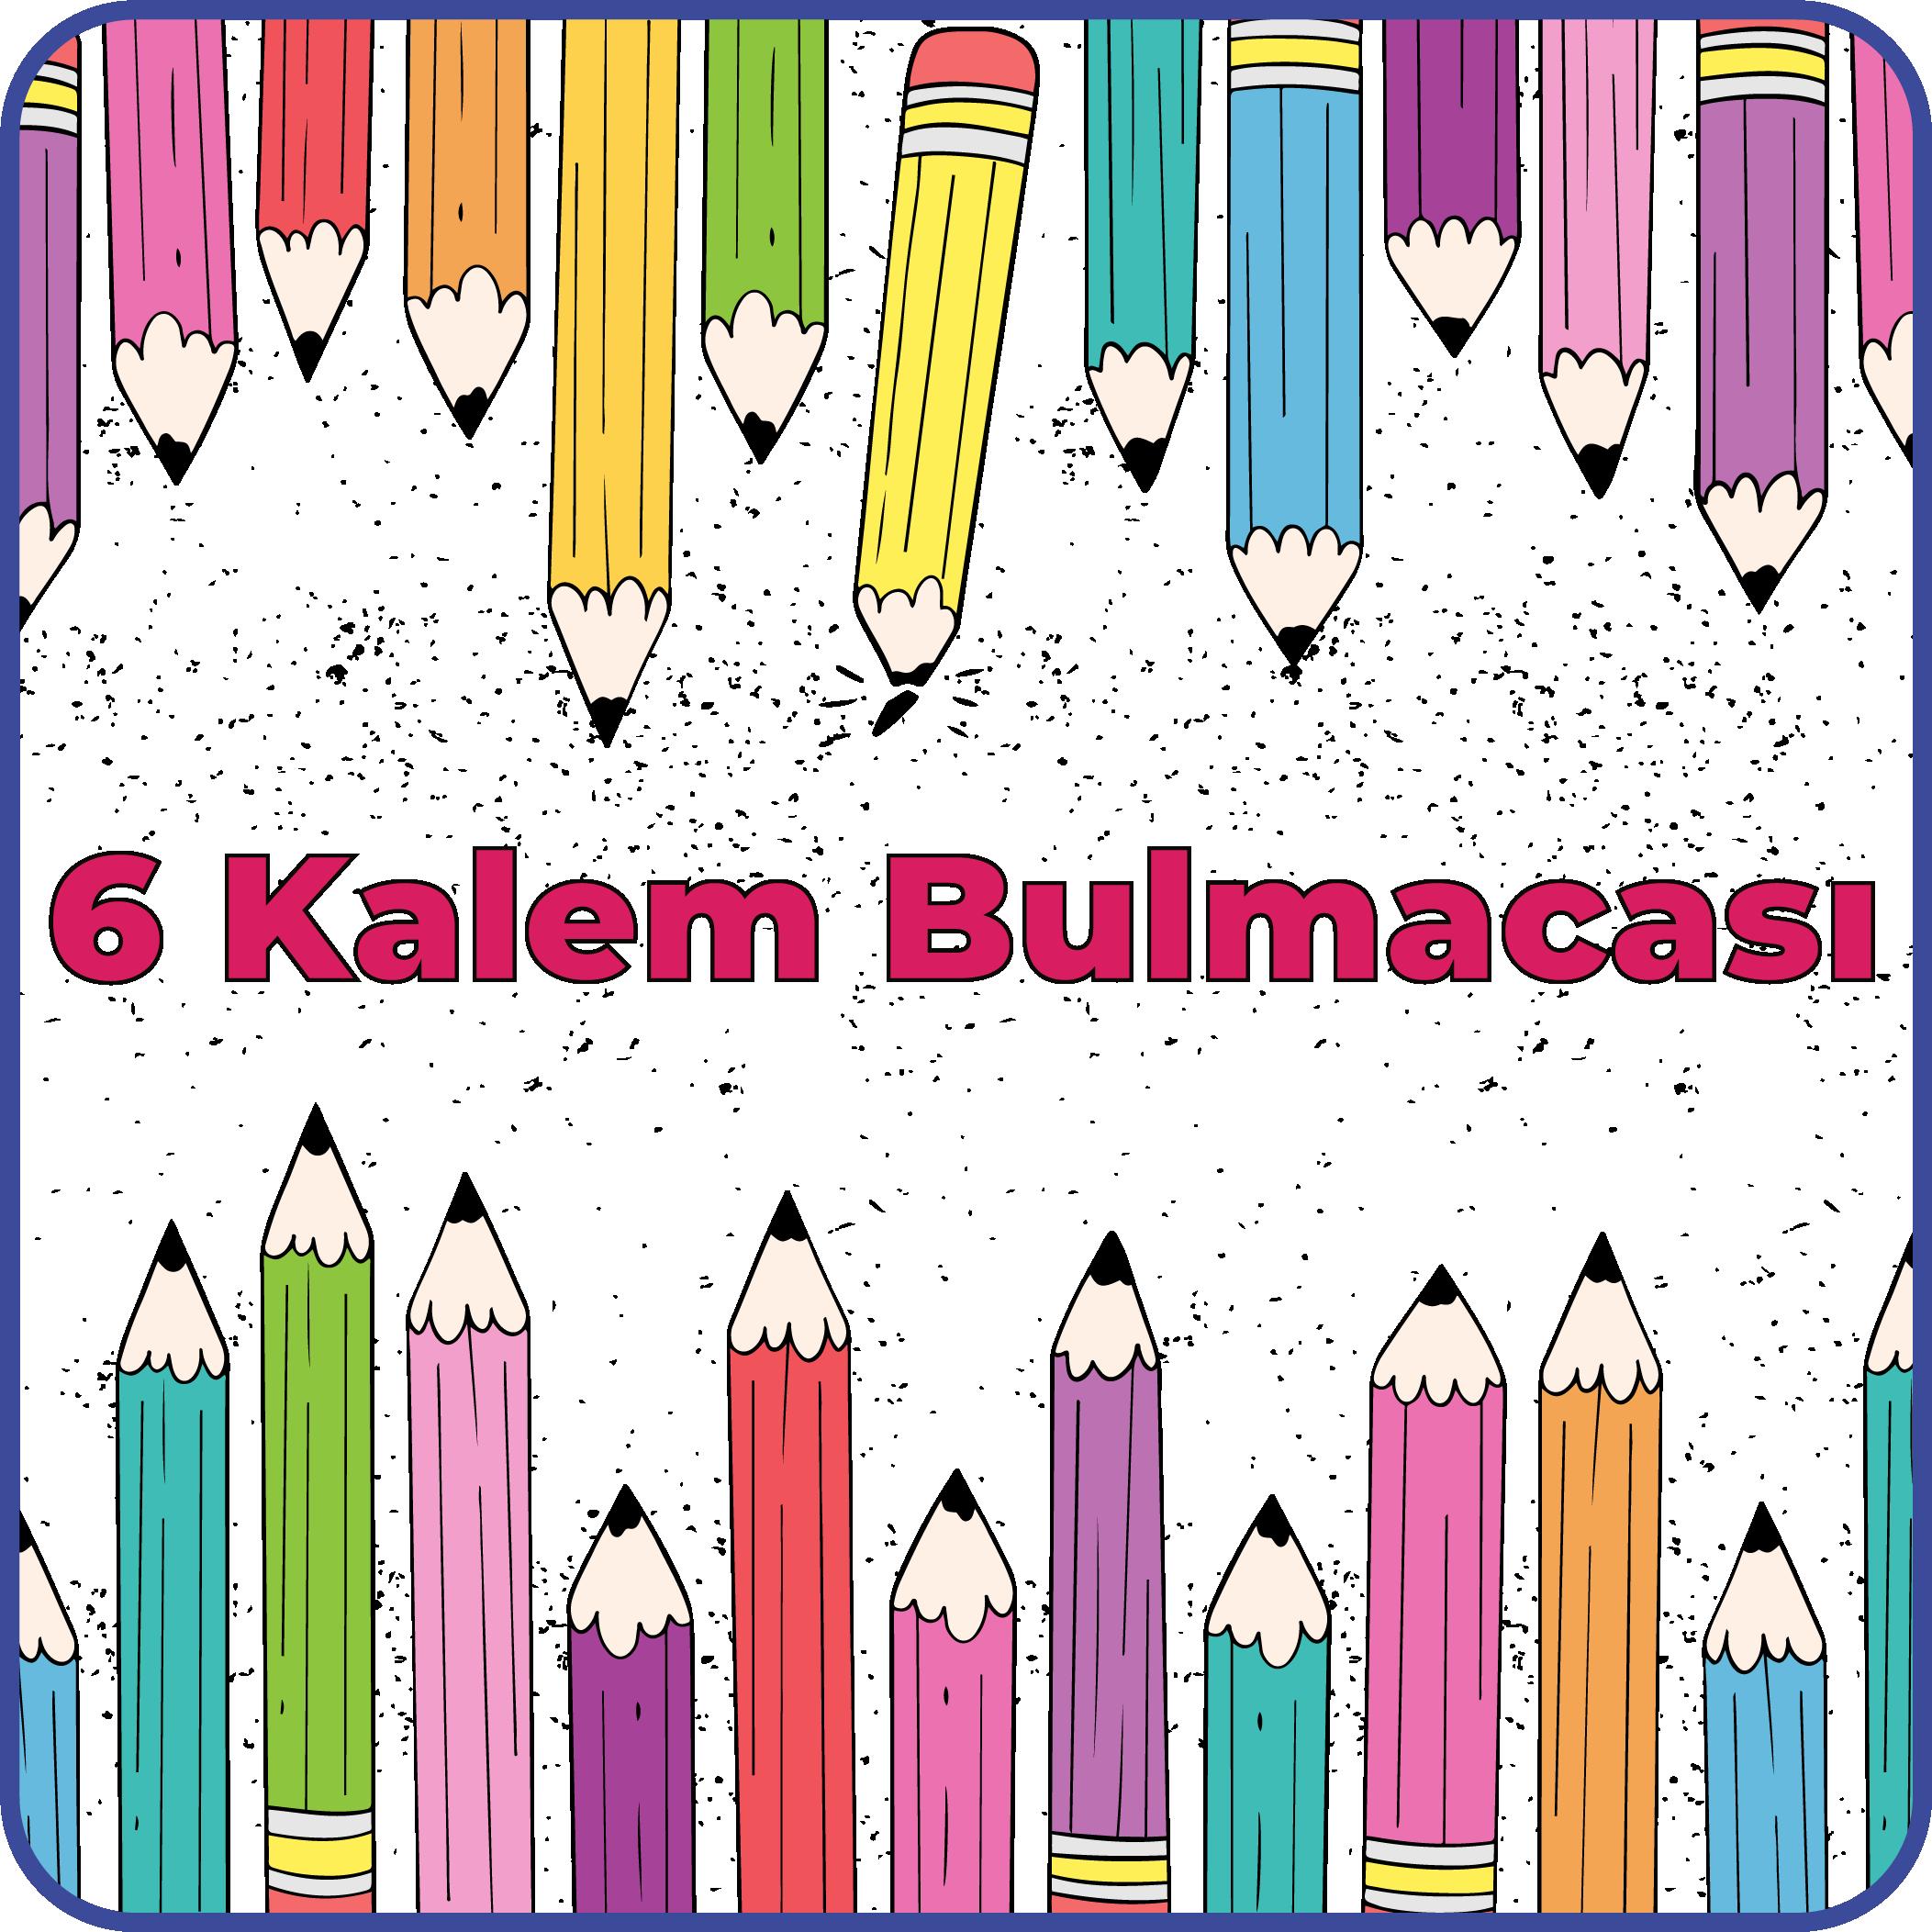 6 kalem1